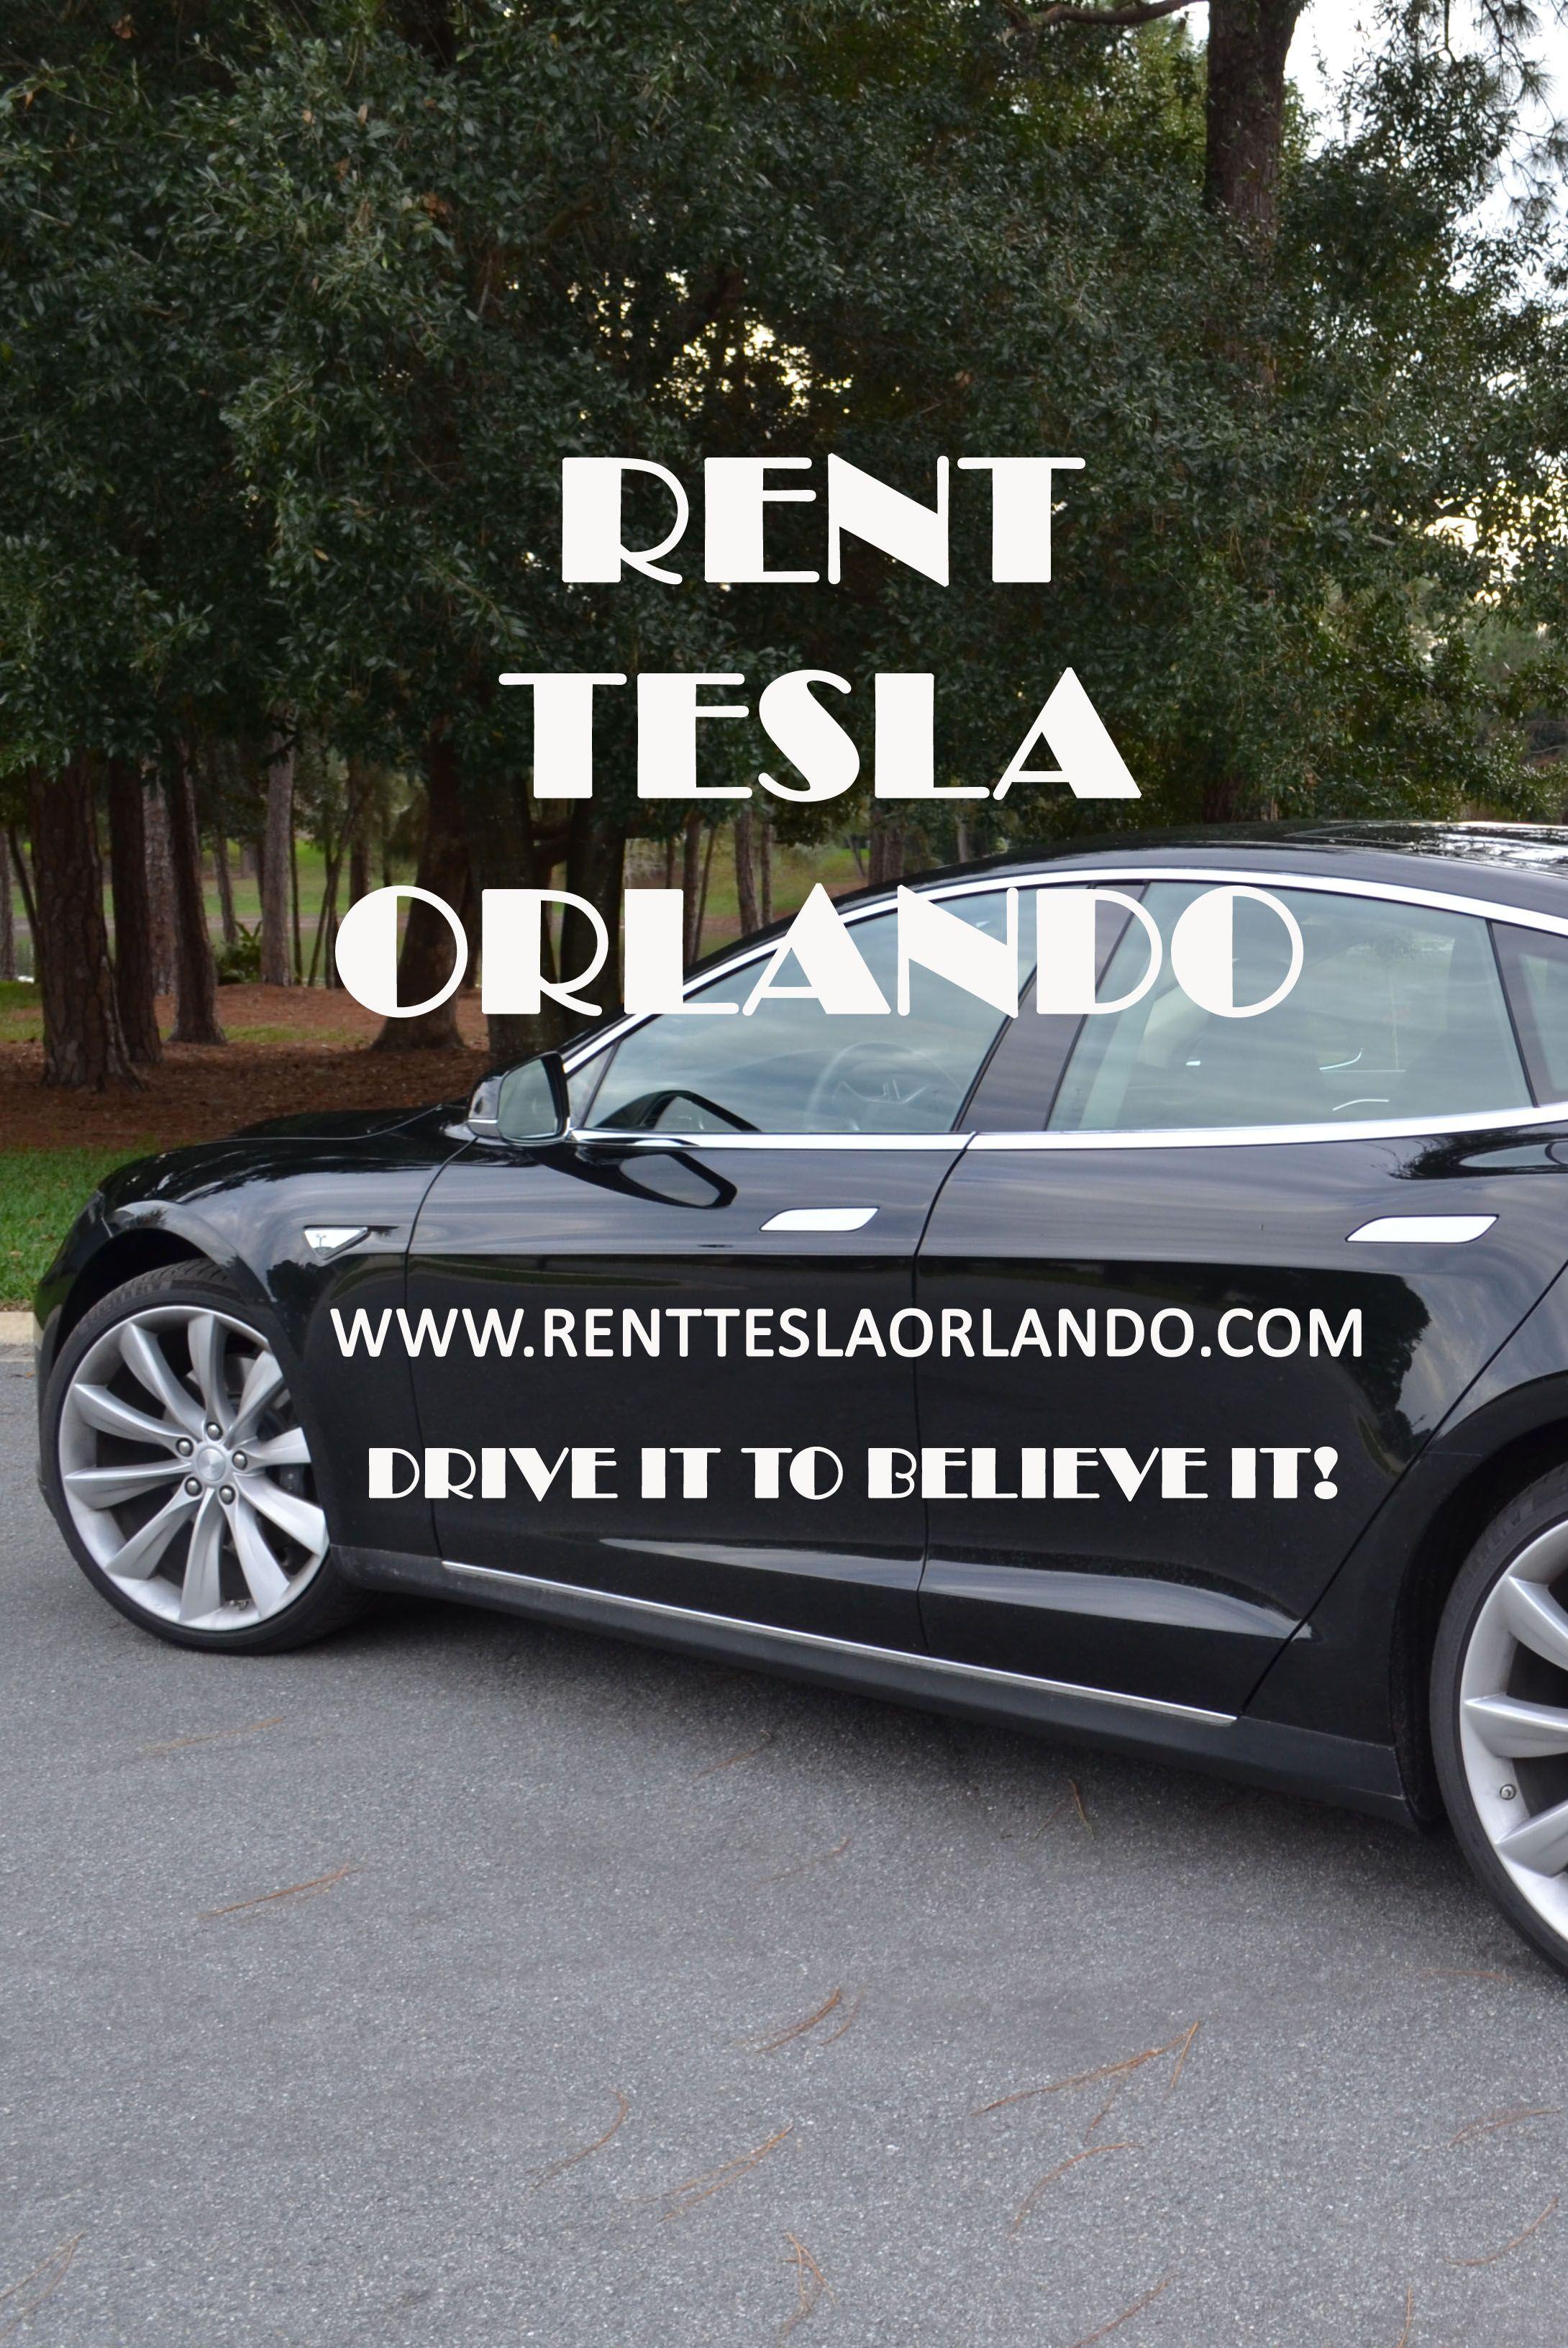 Rent A Tesla In Orlando Tesla Tesla Model S Rent